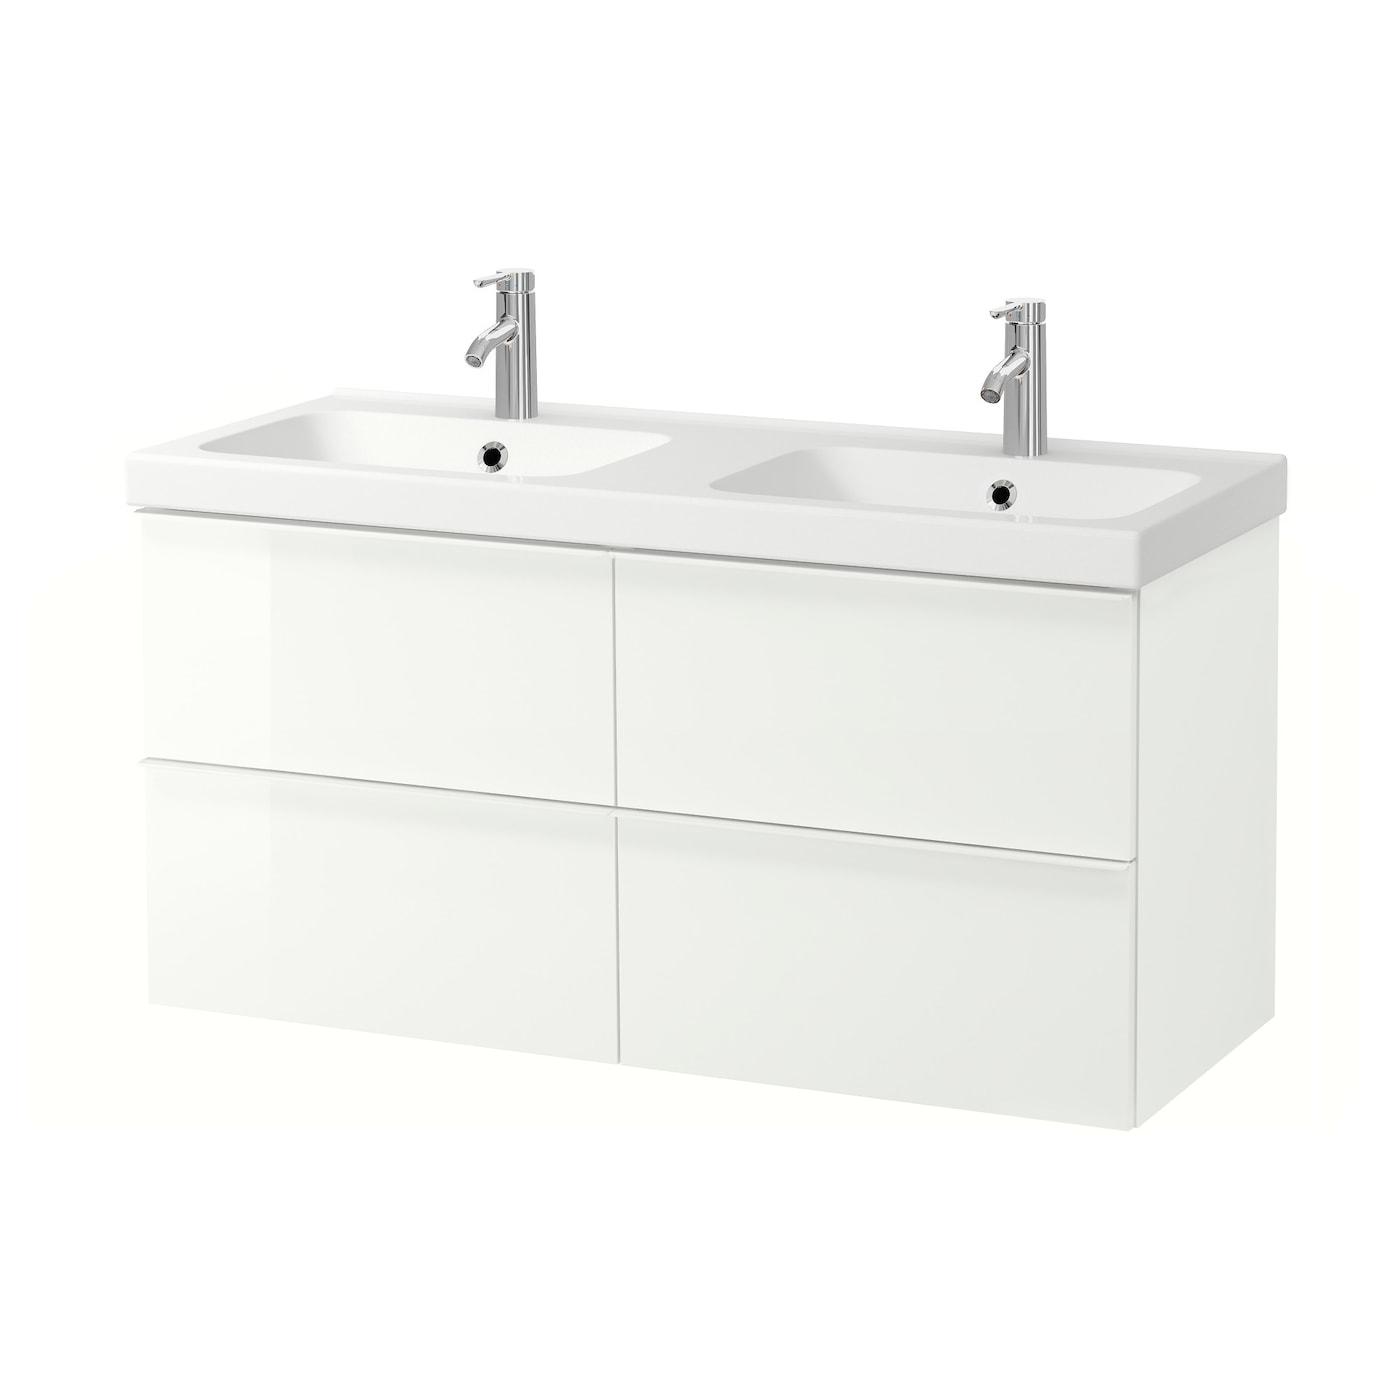 Godmorgon Odensvik Bathroom Vanity High Gloss White Dalskar Faucet 123x49x64 Cm Find It Here Ikea